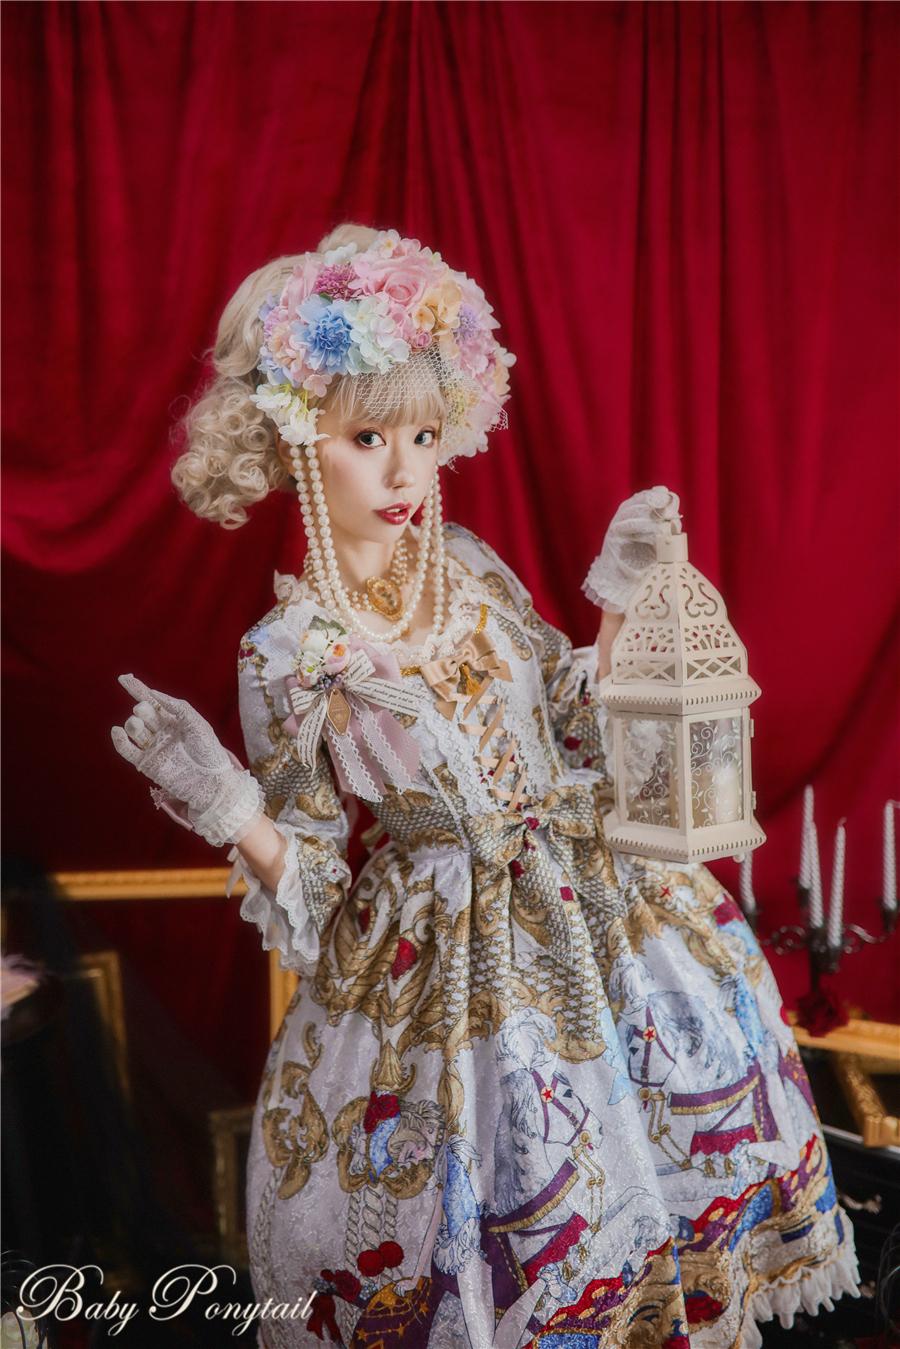 Baby Ponytail_Circus Princess_Silver OP_Kaka_16.jpg